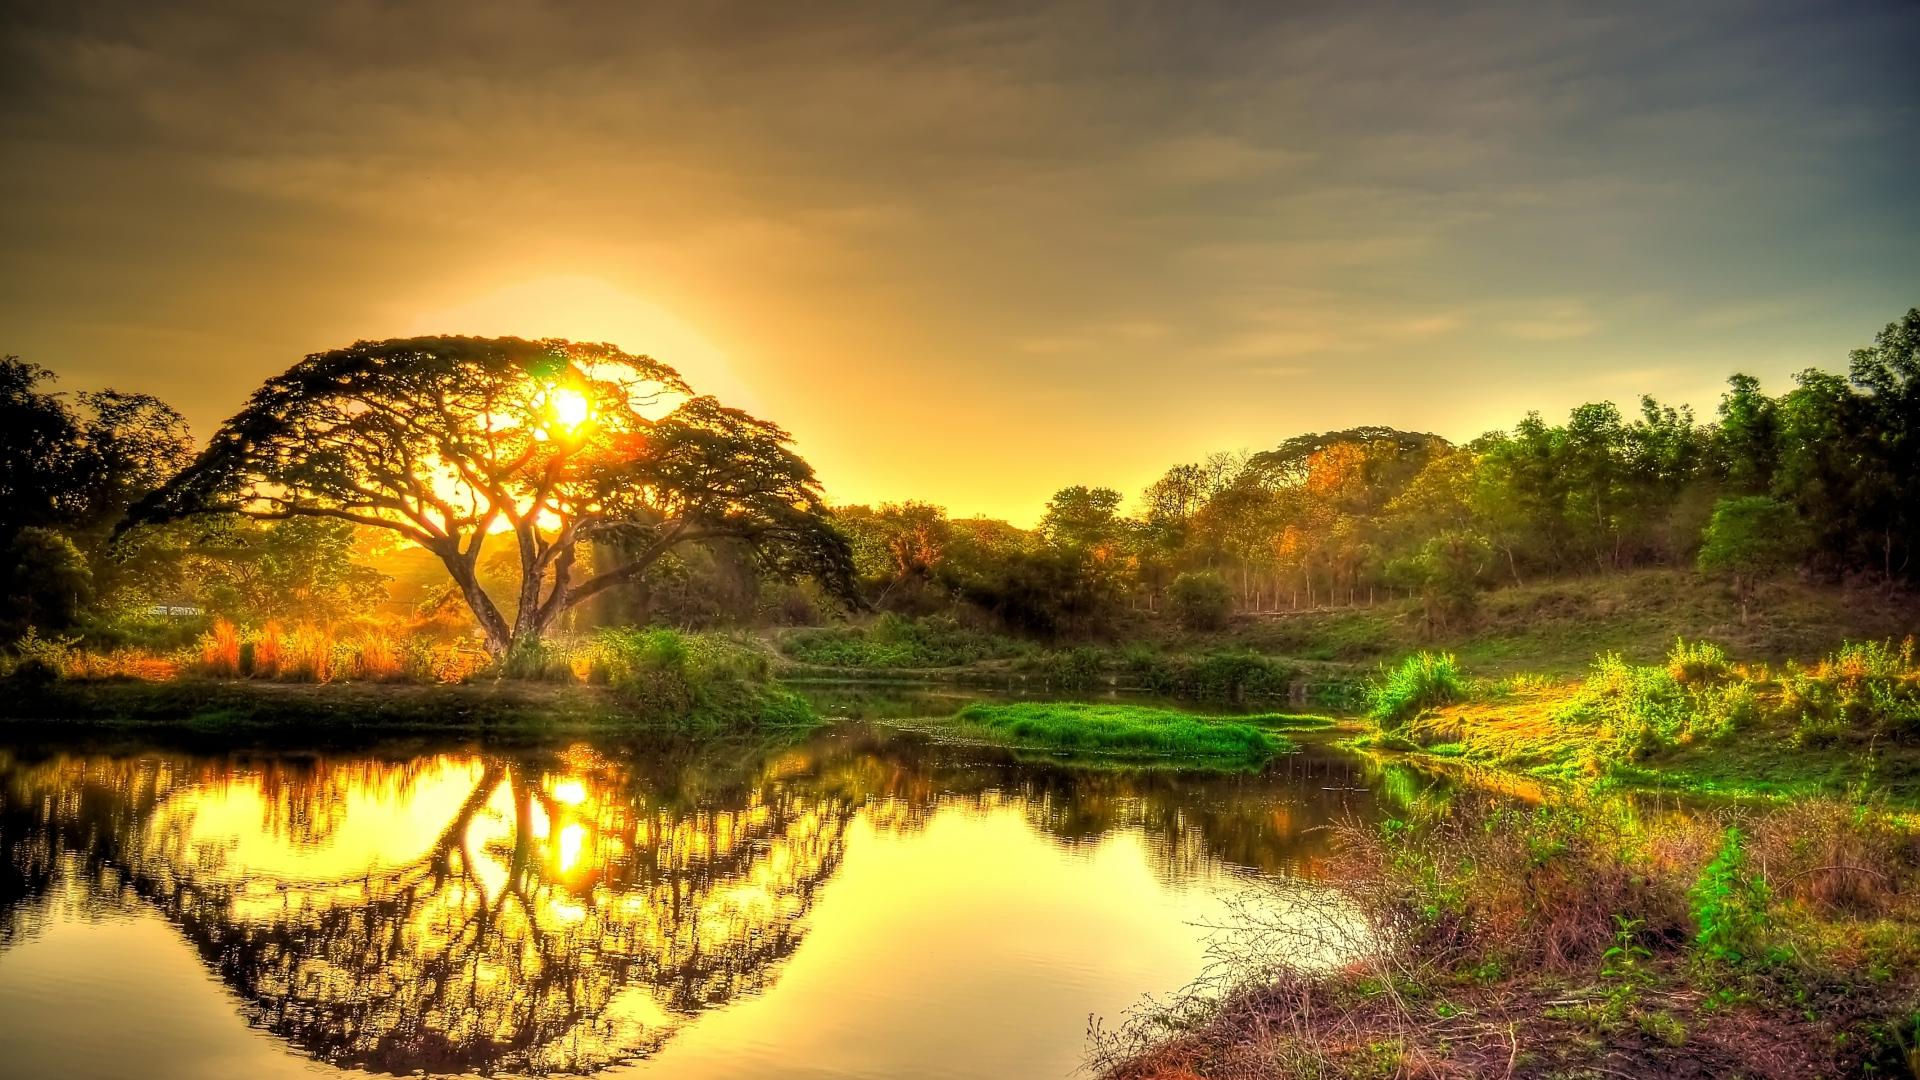 HD-Nature-Wallpapers-1080p-Full-Hd.jpg